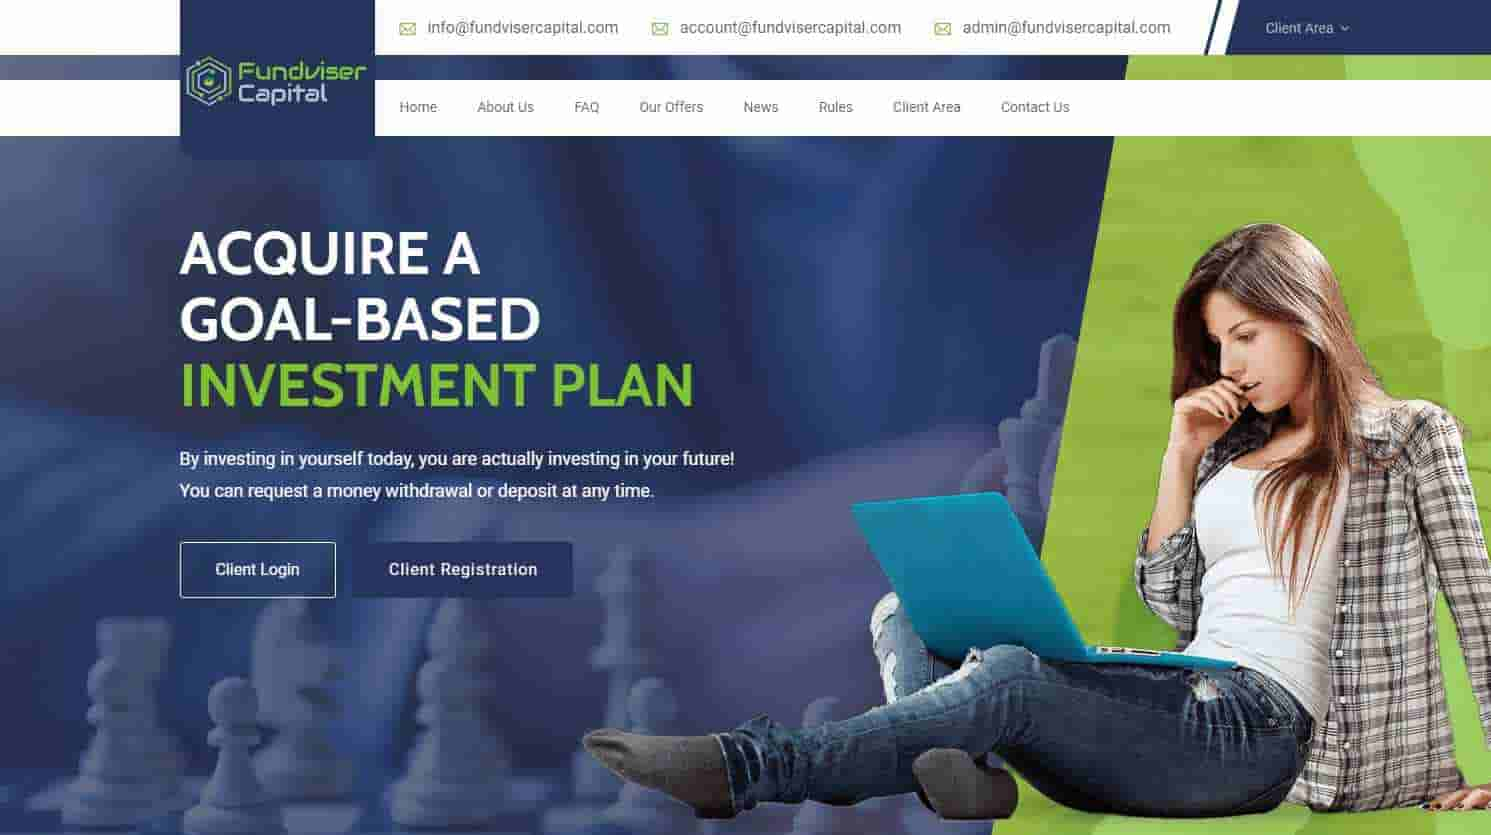 Fundviser Capital